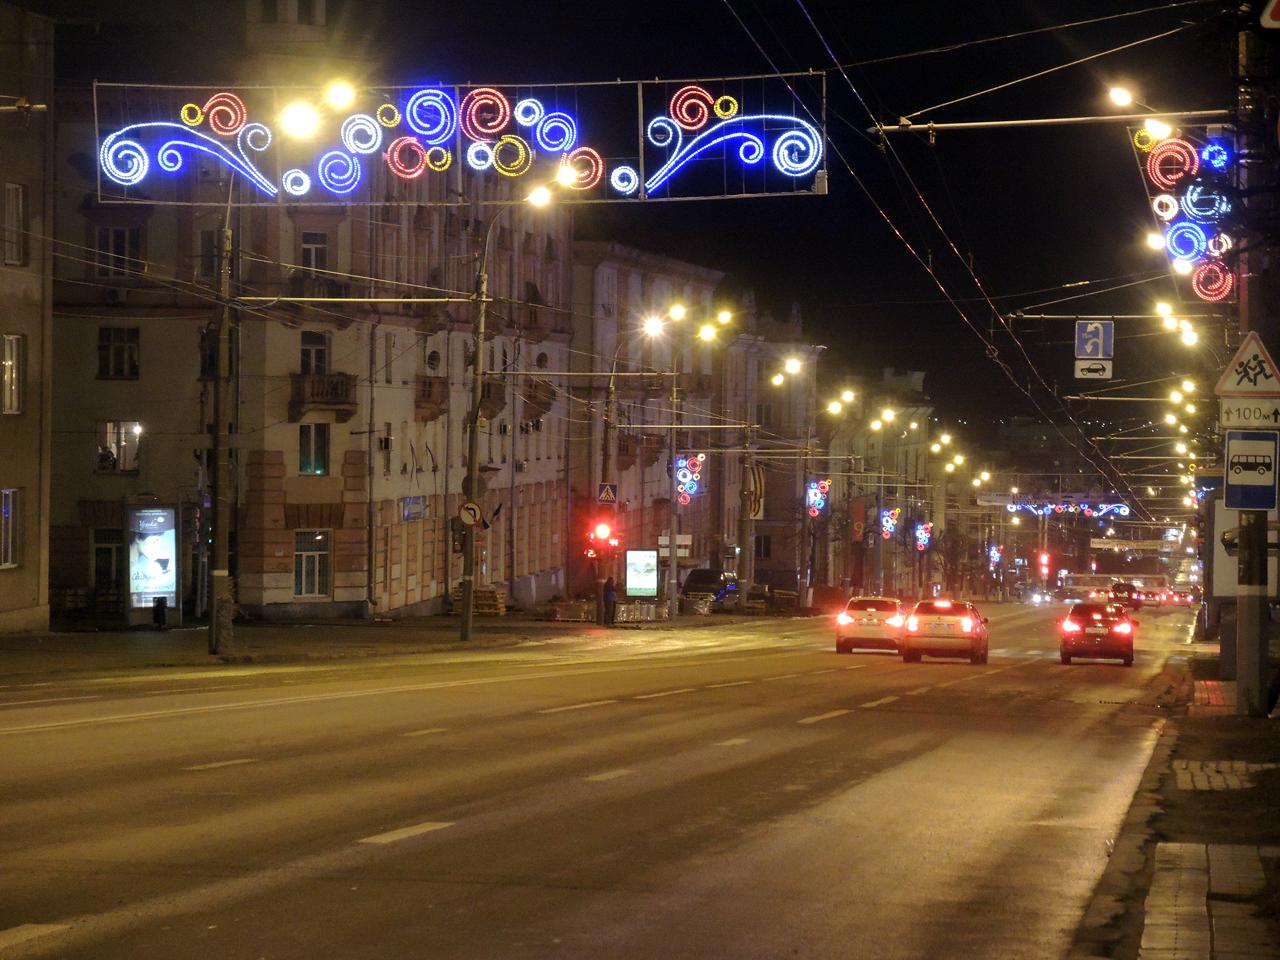 http://tamdaleko.ru/wp-content/uploads/2014/07/izhevsk-chast2-16.png